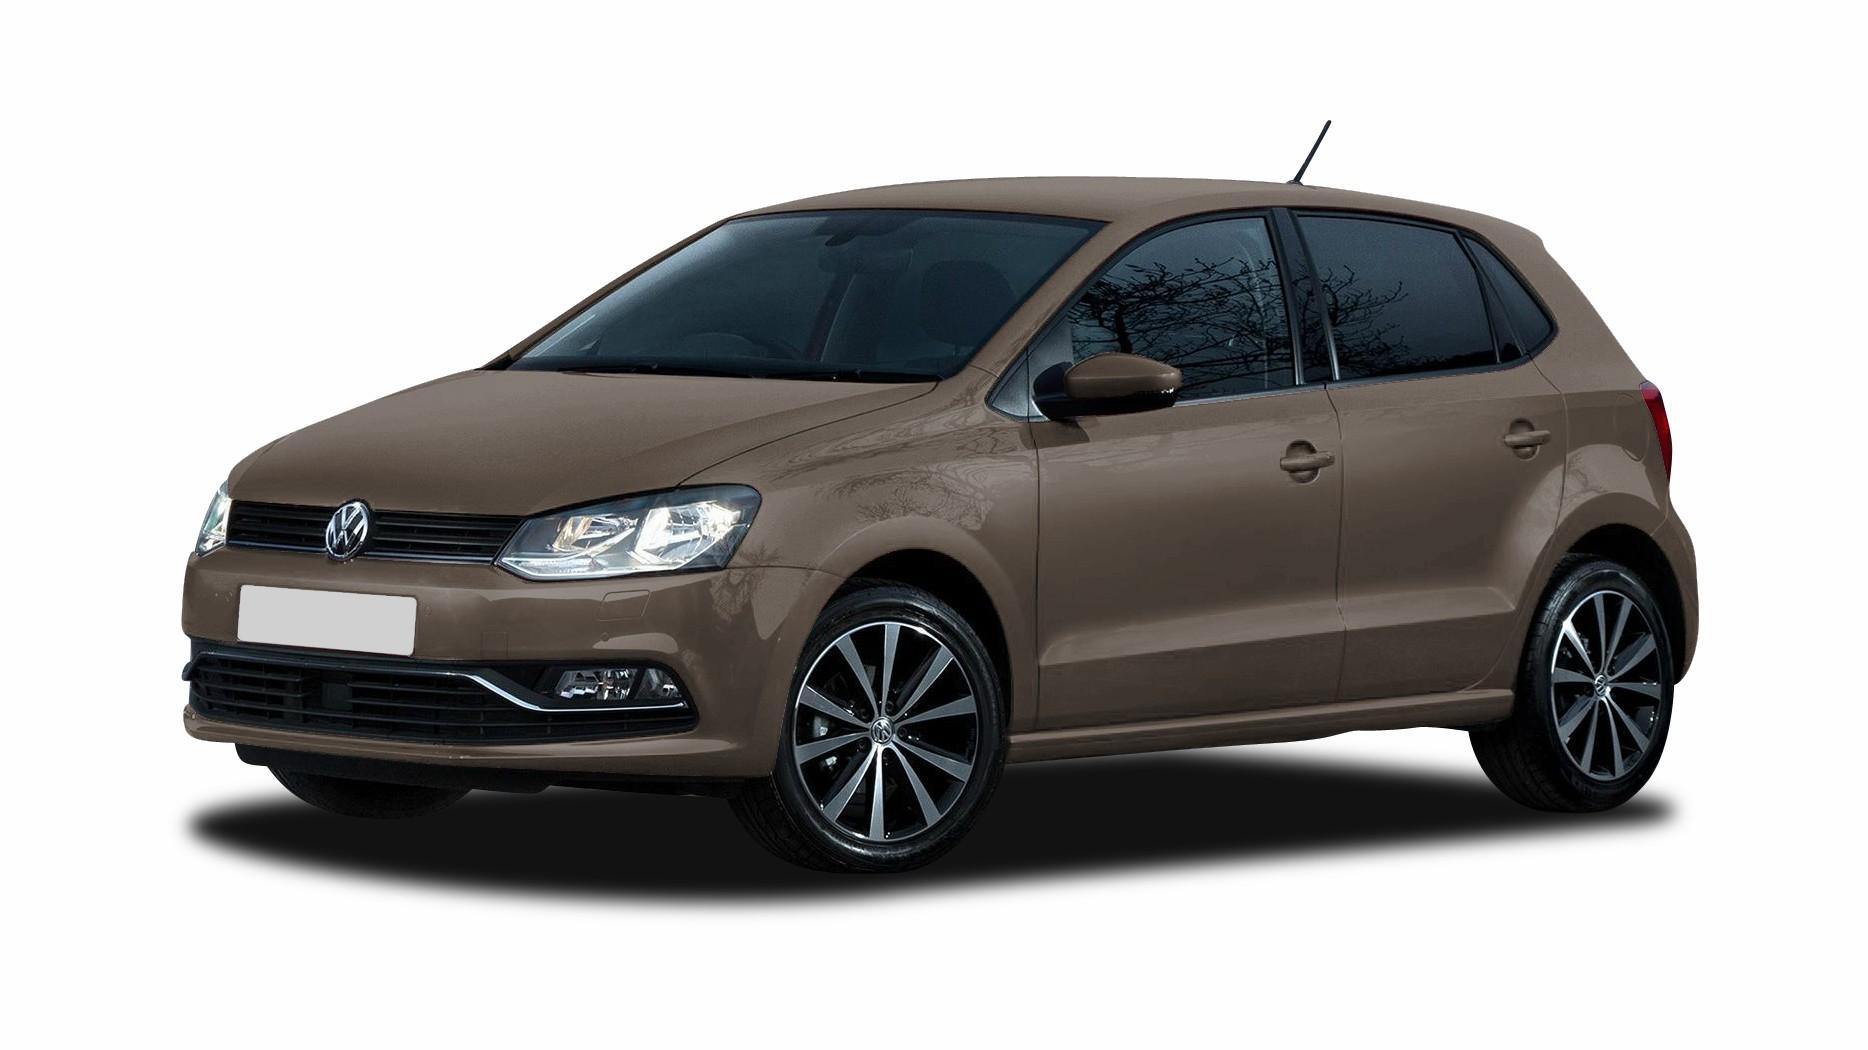 Acheter Volkswagen Polo Trendline Surequipe Trendline Surequipe chez un mandataire auto